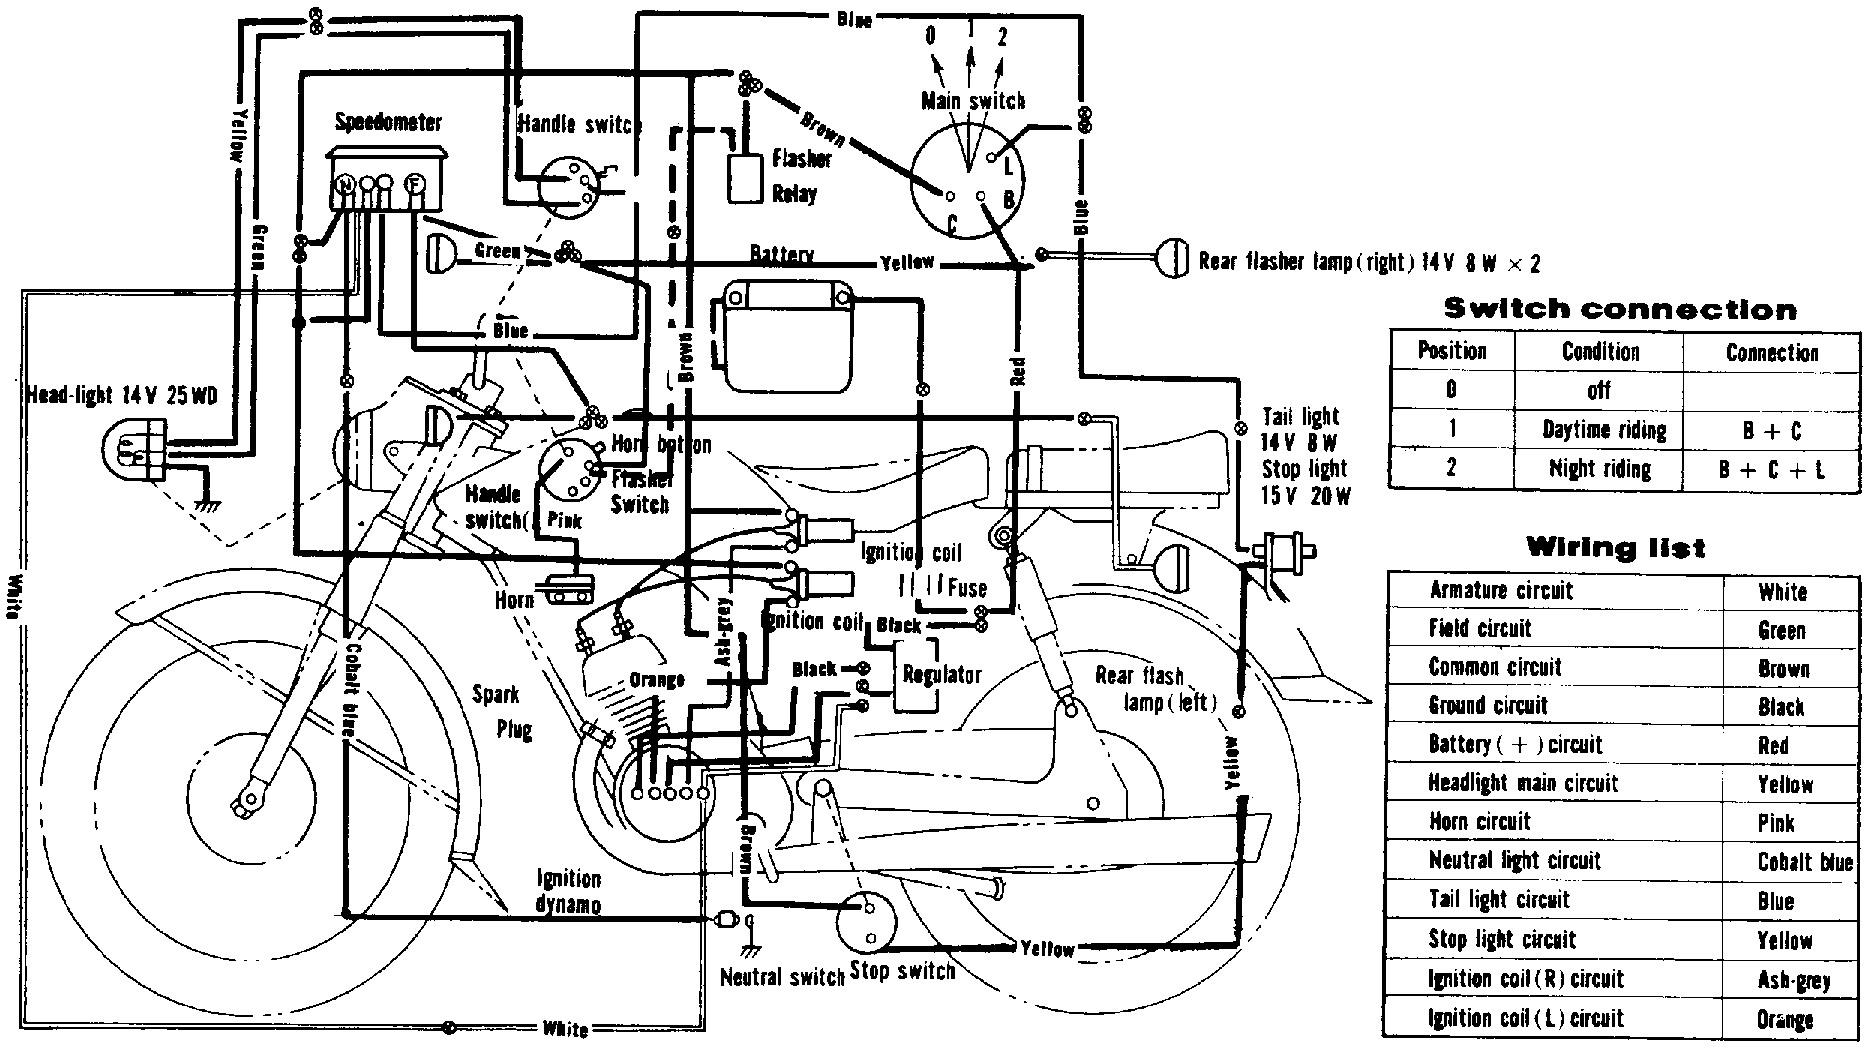 small resolution of yamaha engine schematics wiring diagram paper1971 yamaha engine diagram 19